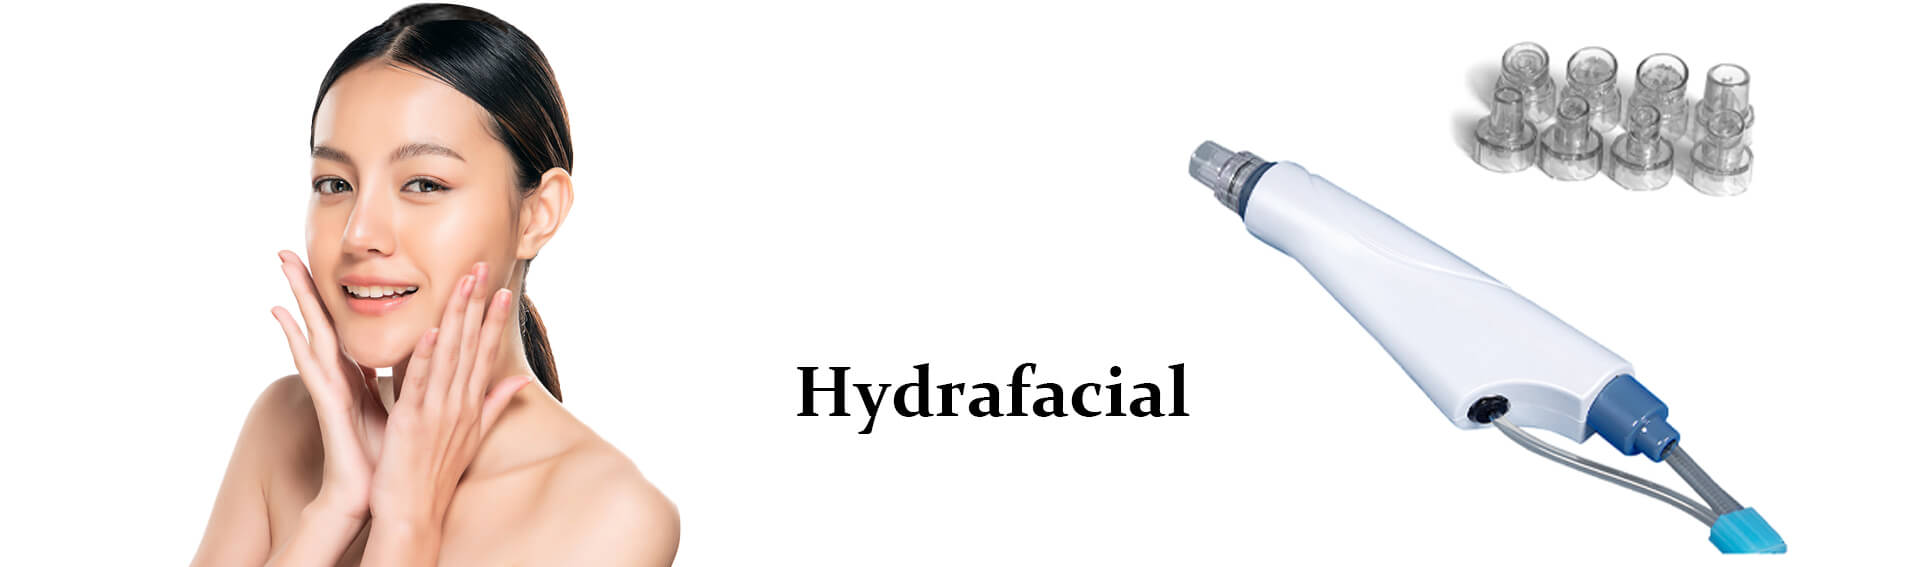 Benefits Of Hydrafacial Machine